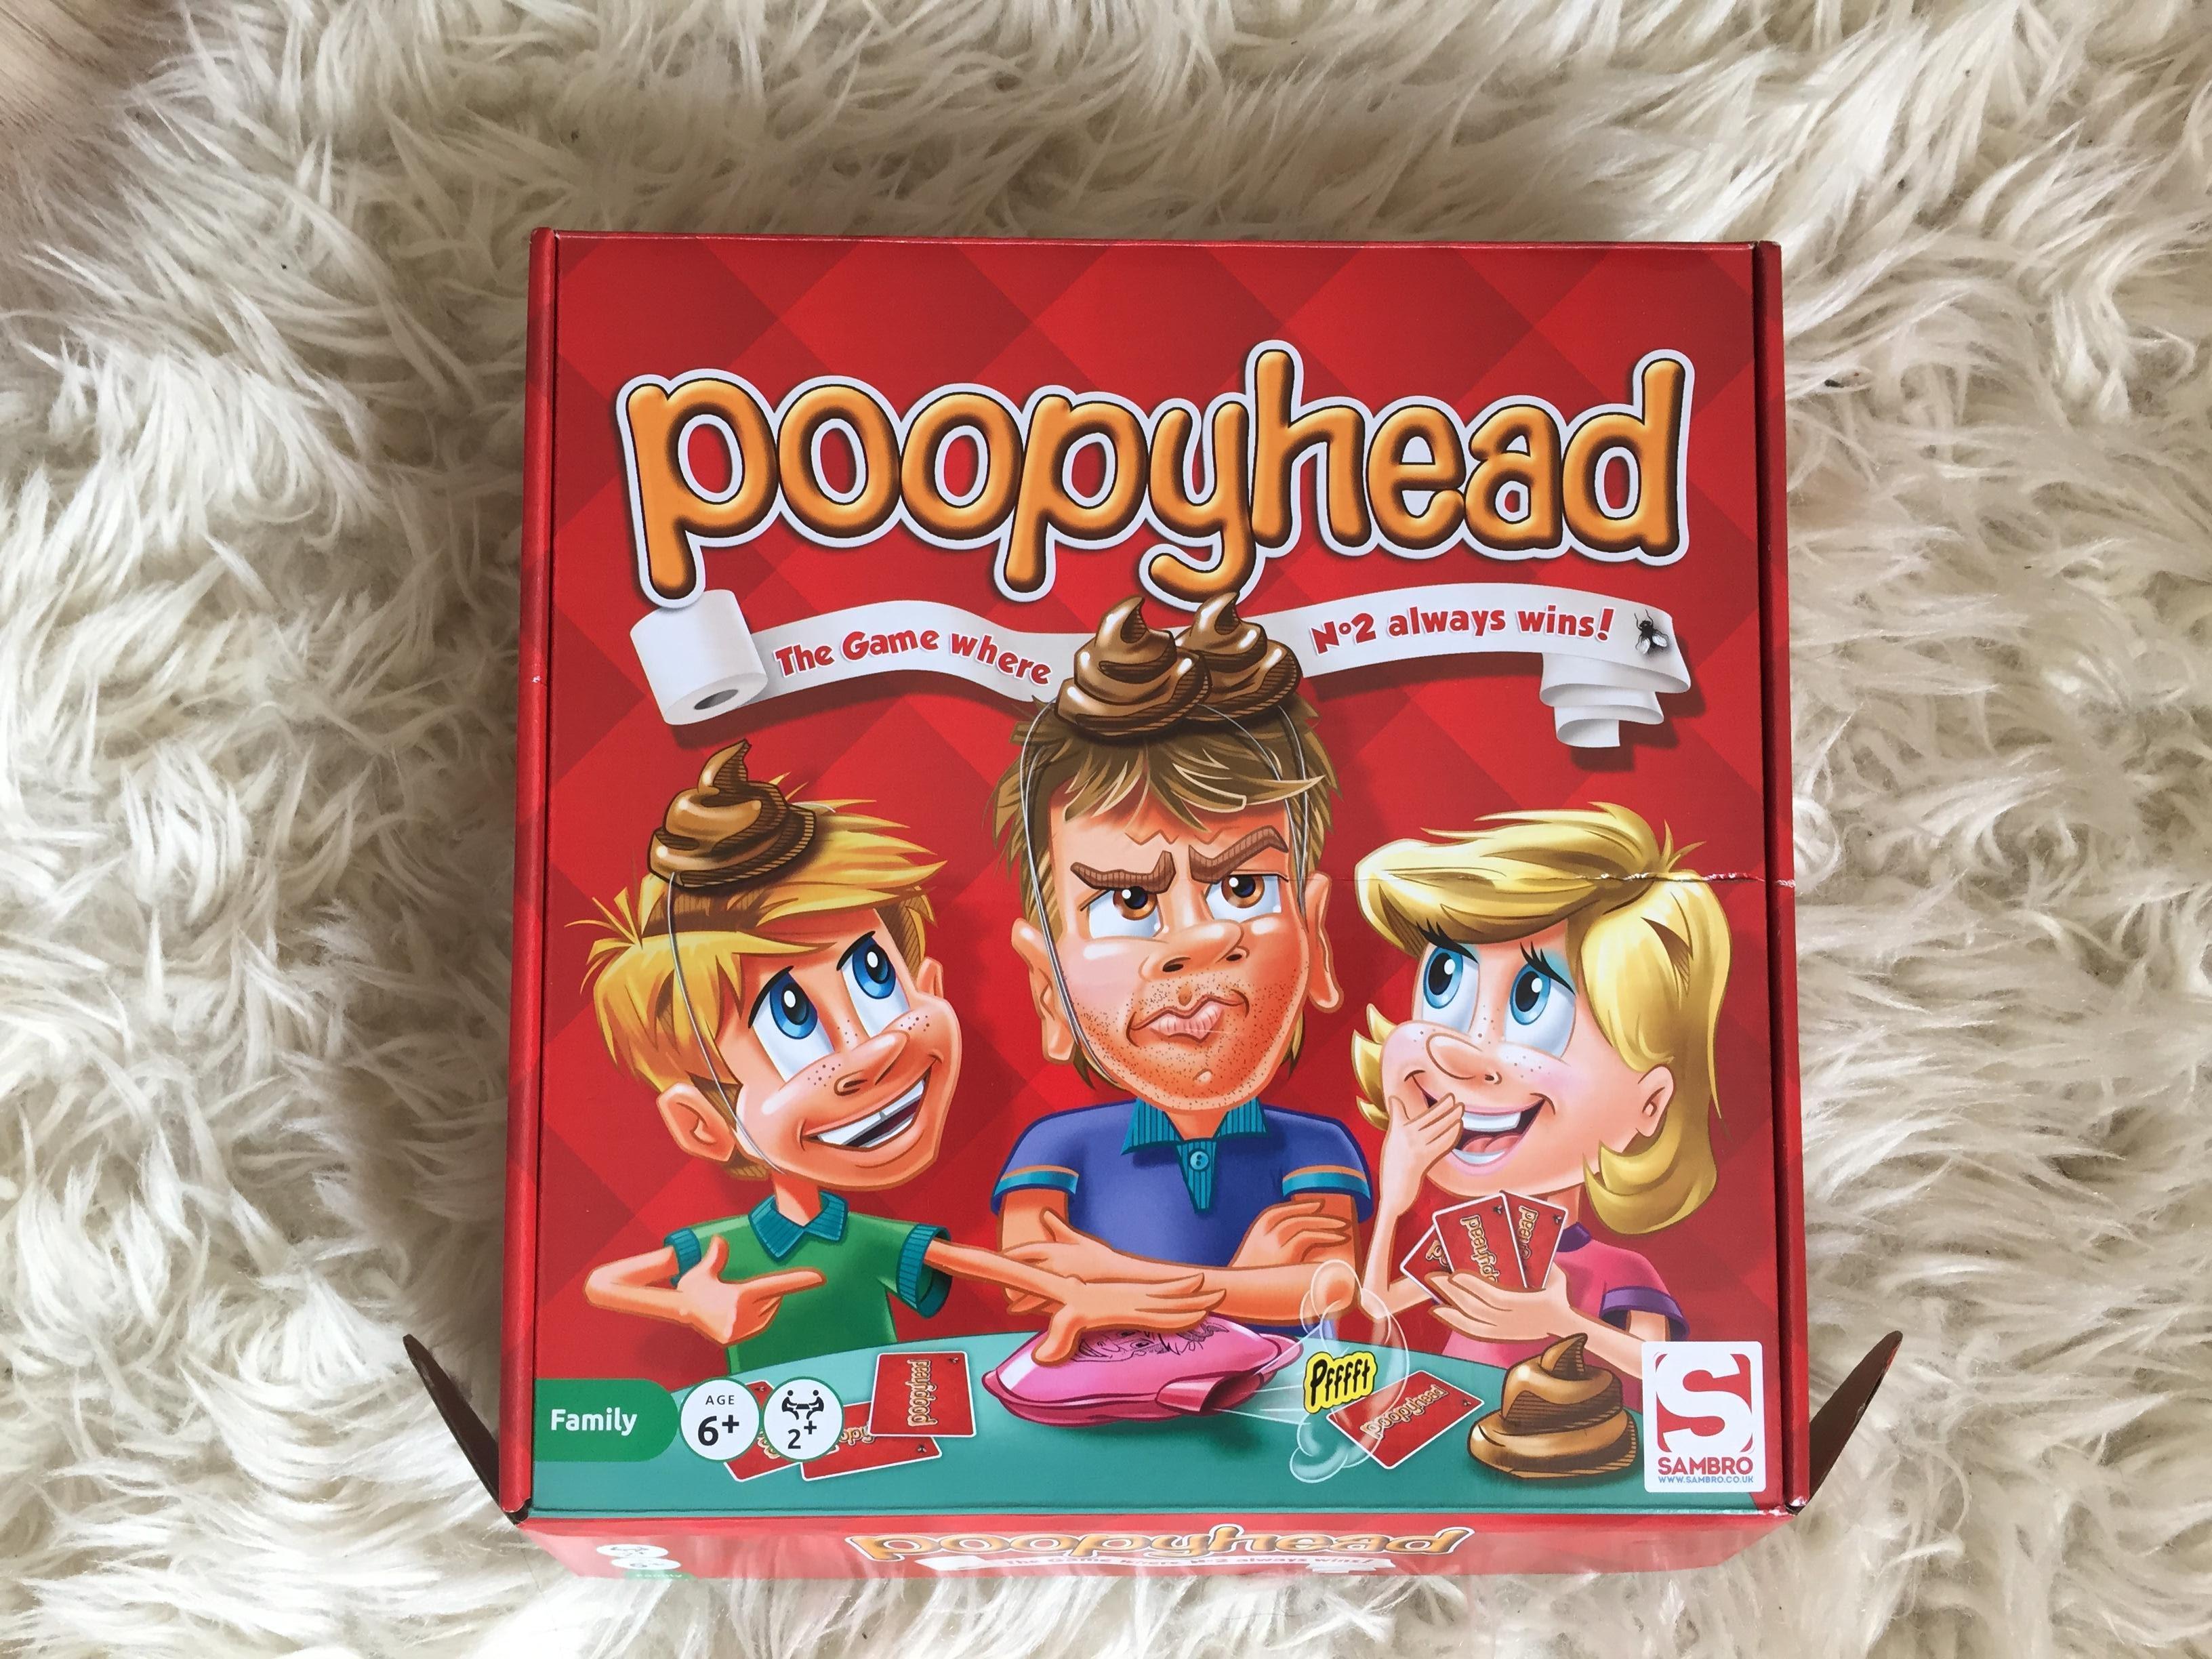 poopy head sambro game box review